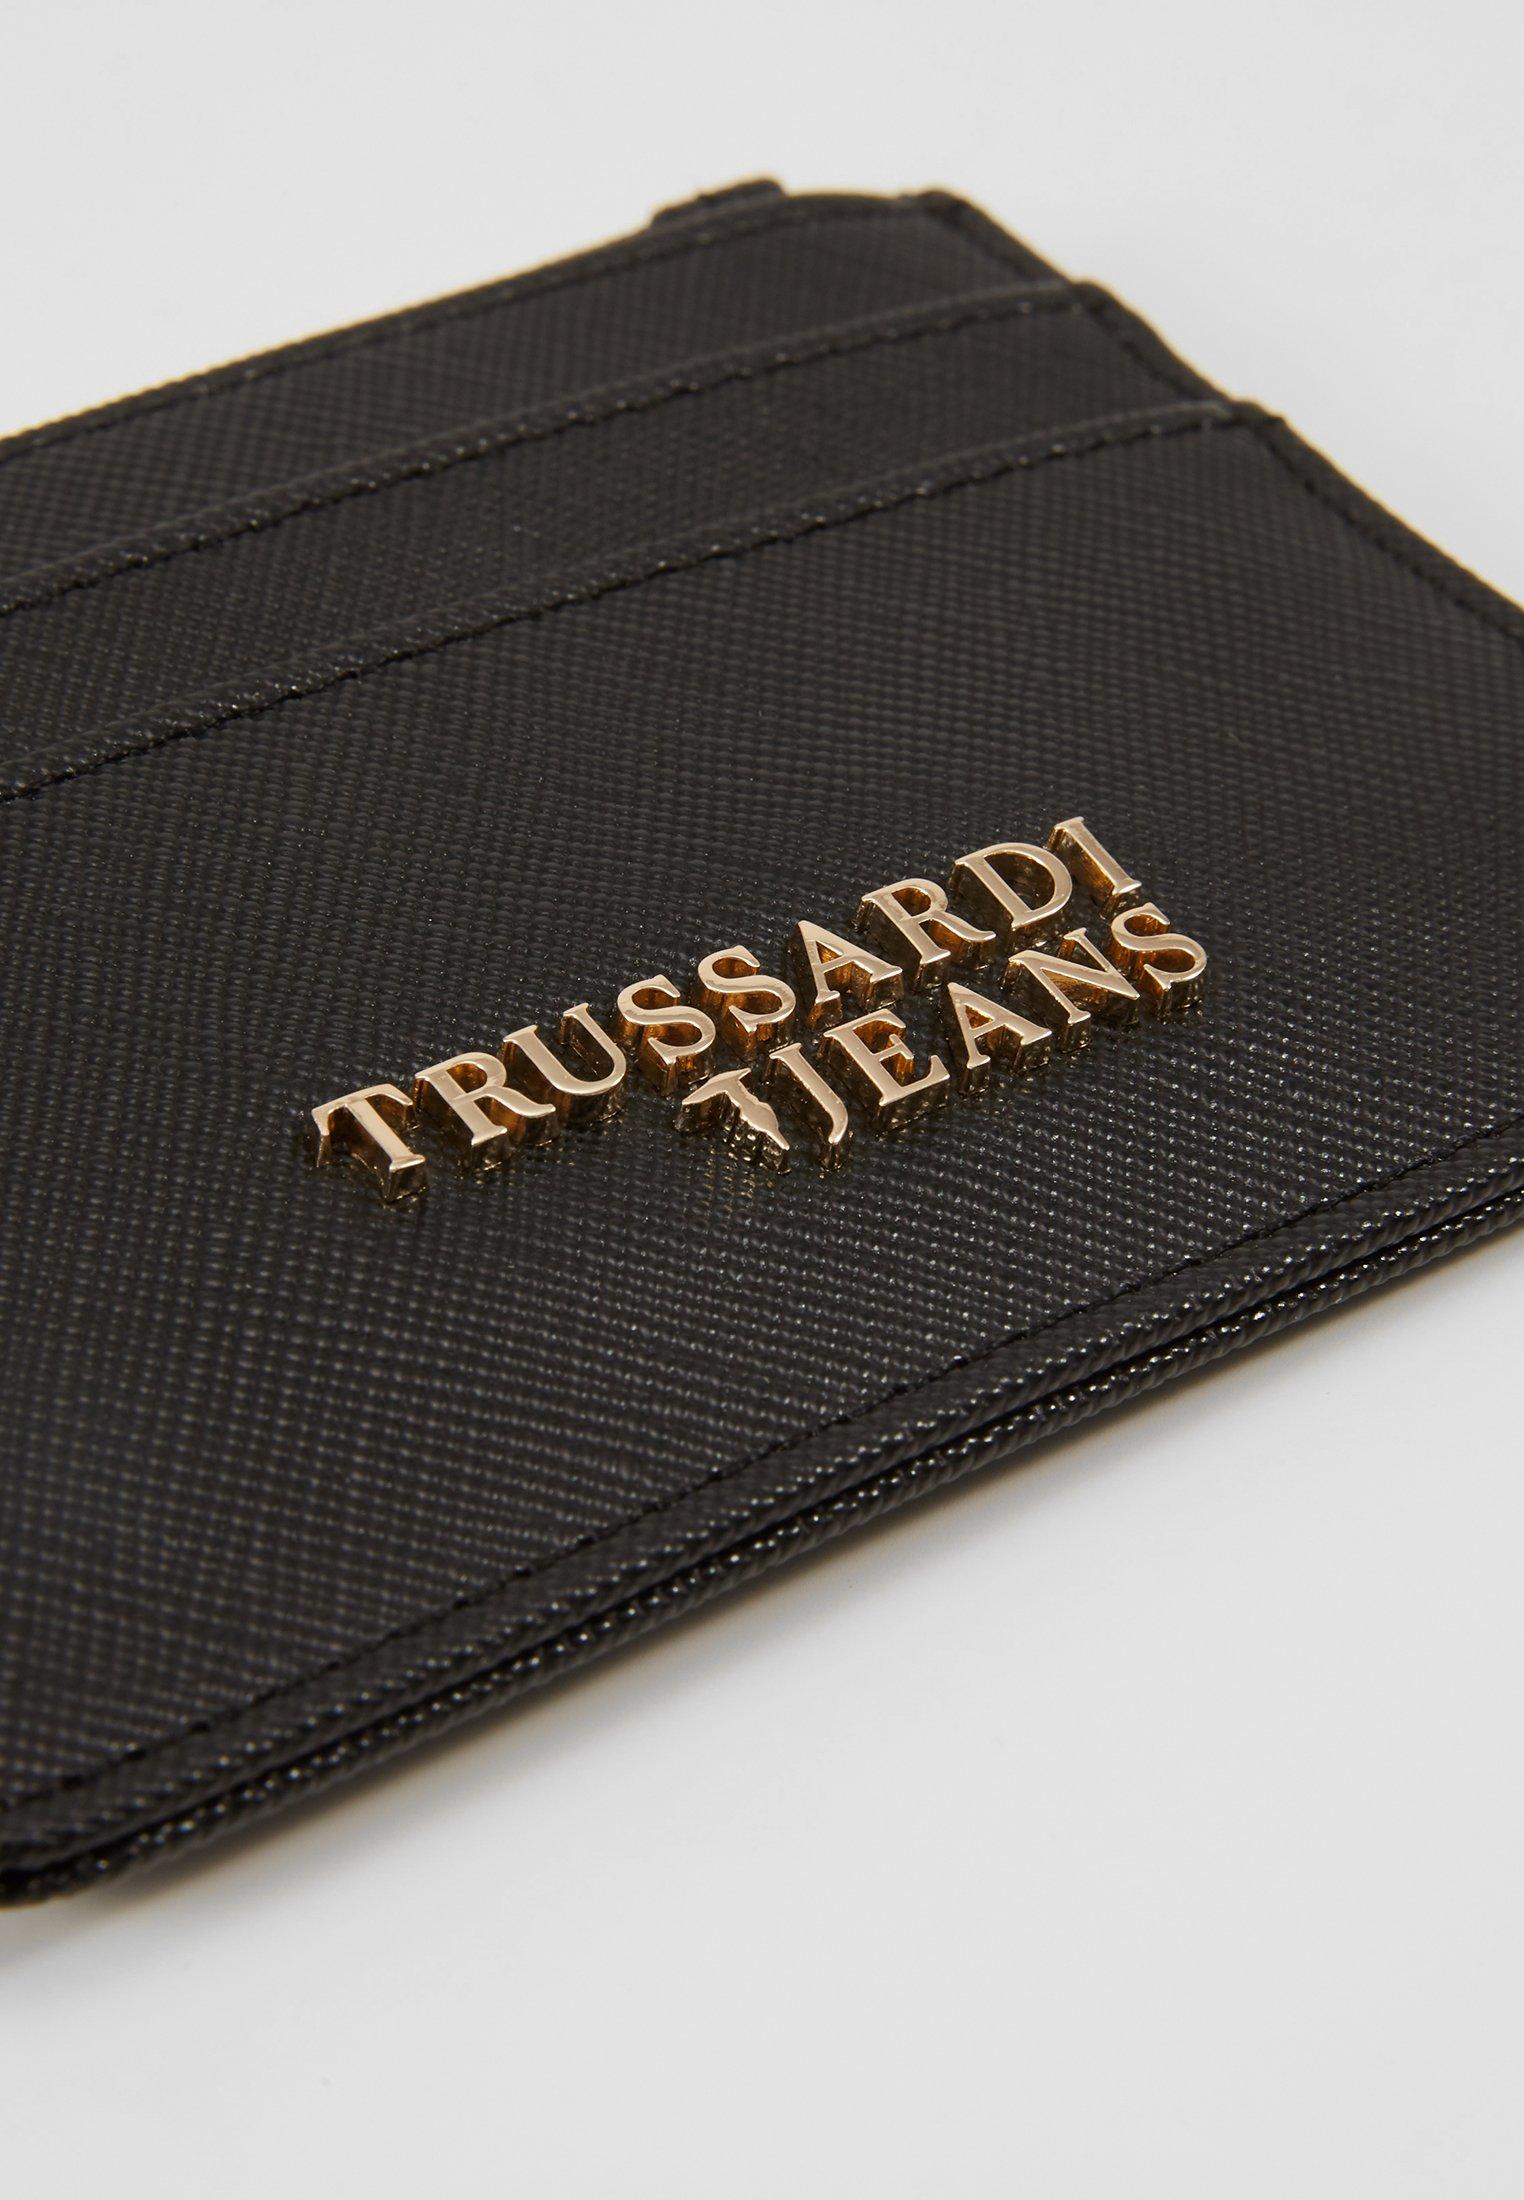 Nouveau style Meilleurs prix Trussardi Jeans BELLA ZIP CARD KEYCHAIN SAFFIANO - Portefeuille - black - ZALANDO.FR dM60u